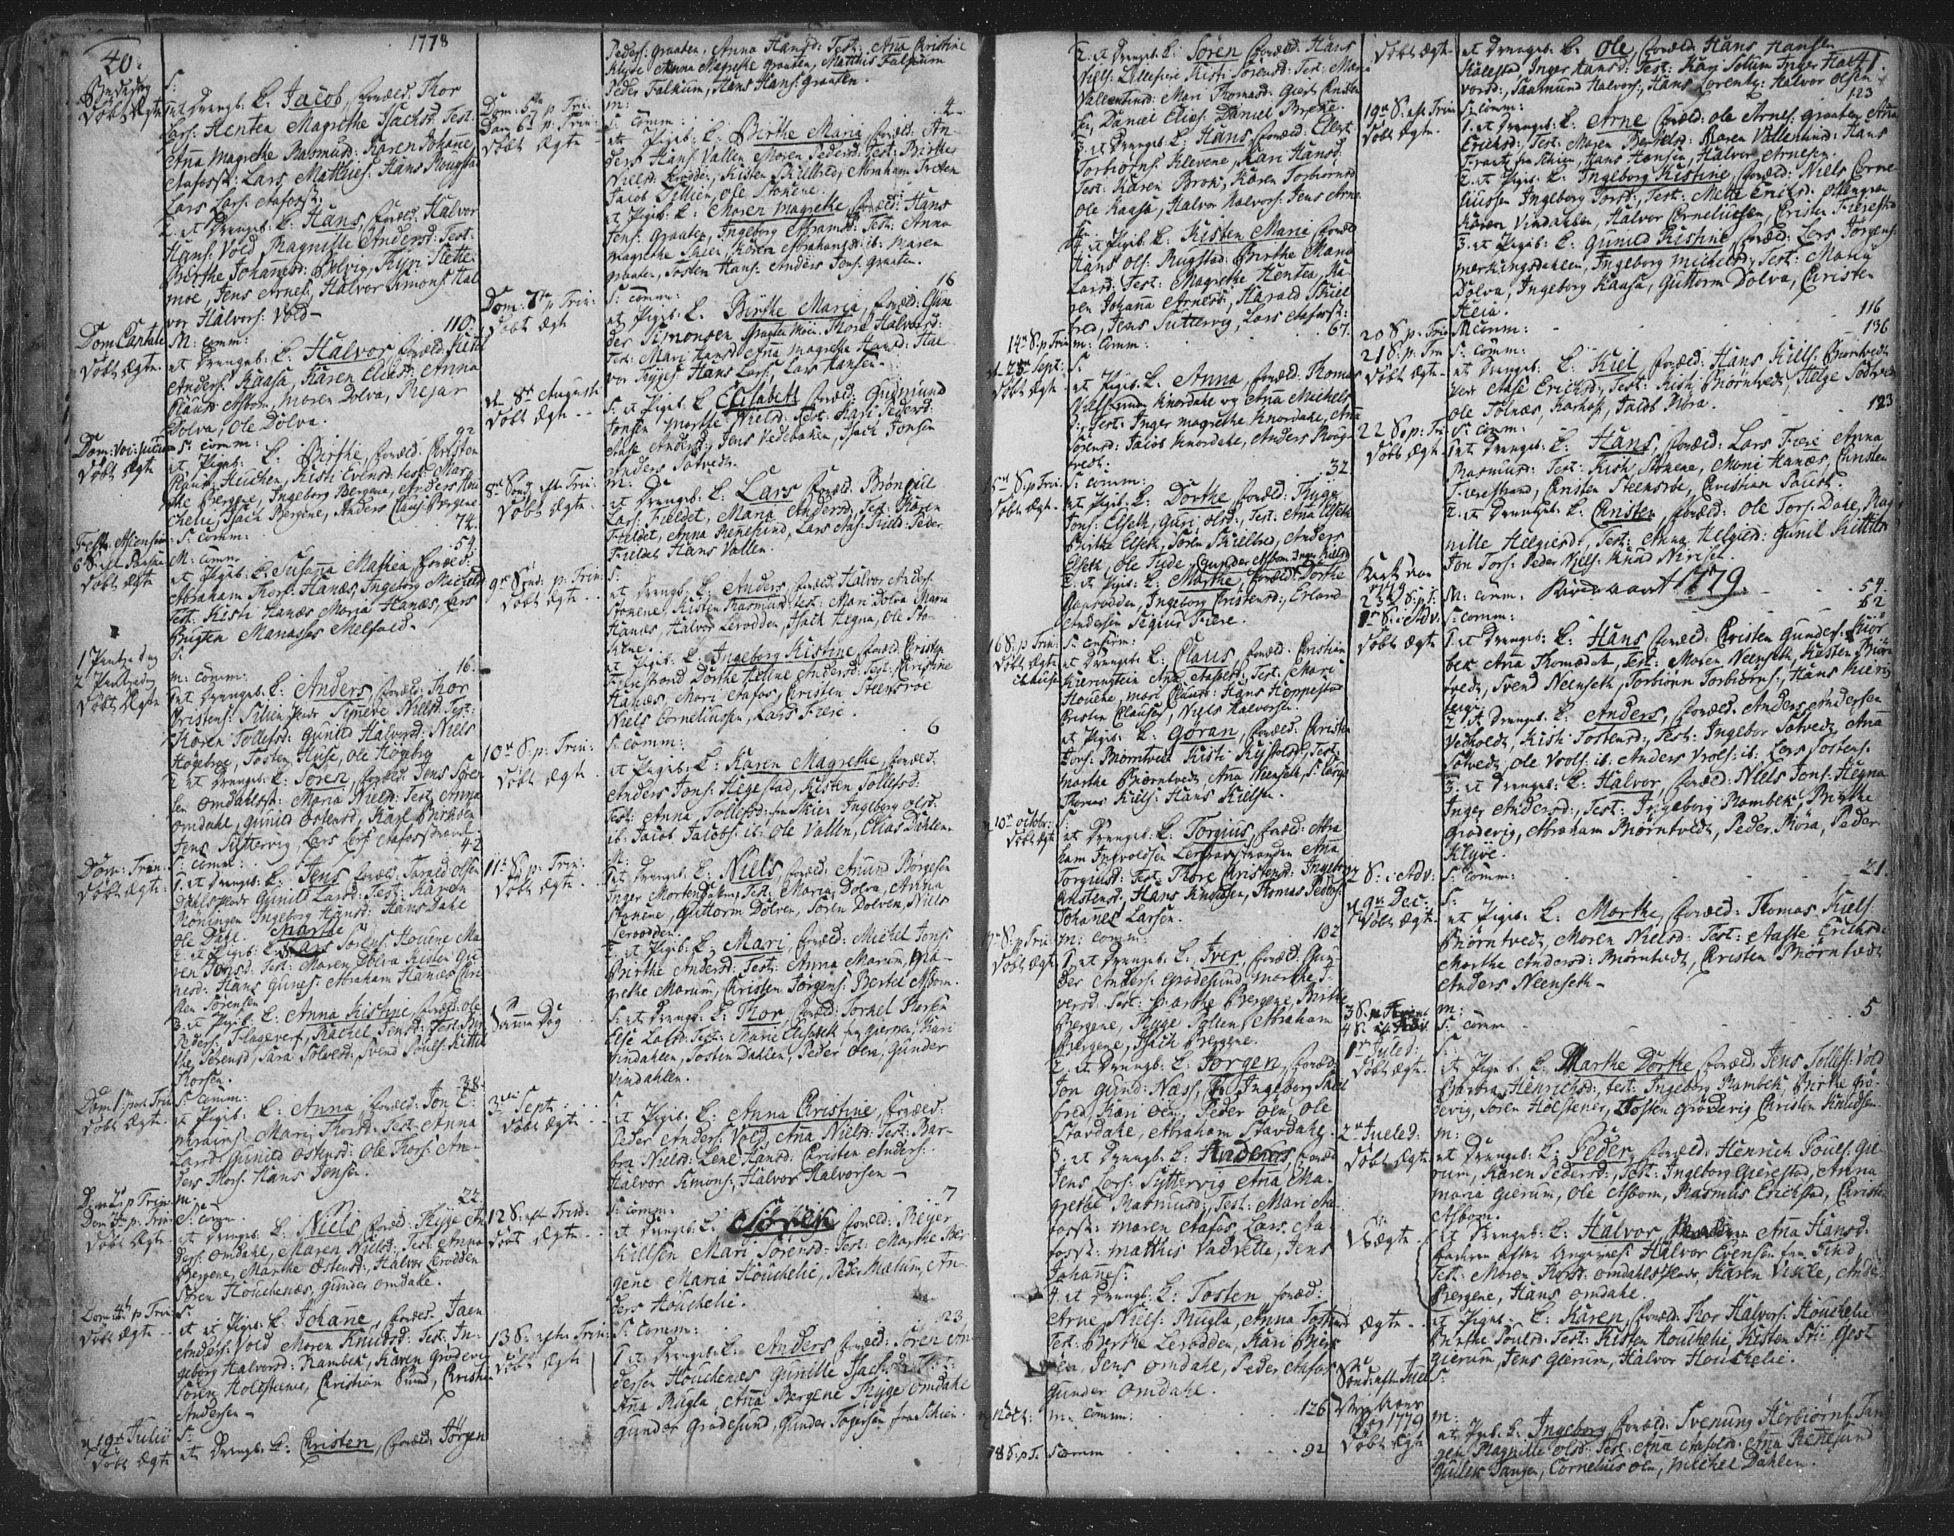 SAKO, Solum kirkebøker, F/Fa/L0003: Ministerialbok nr. I 3, 1761-1814, s. 40-41